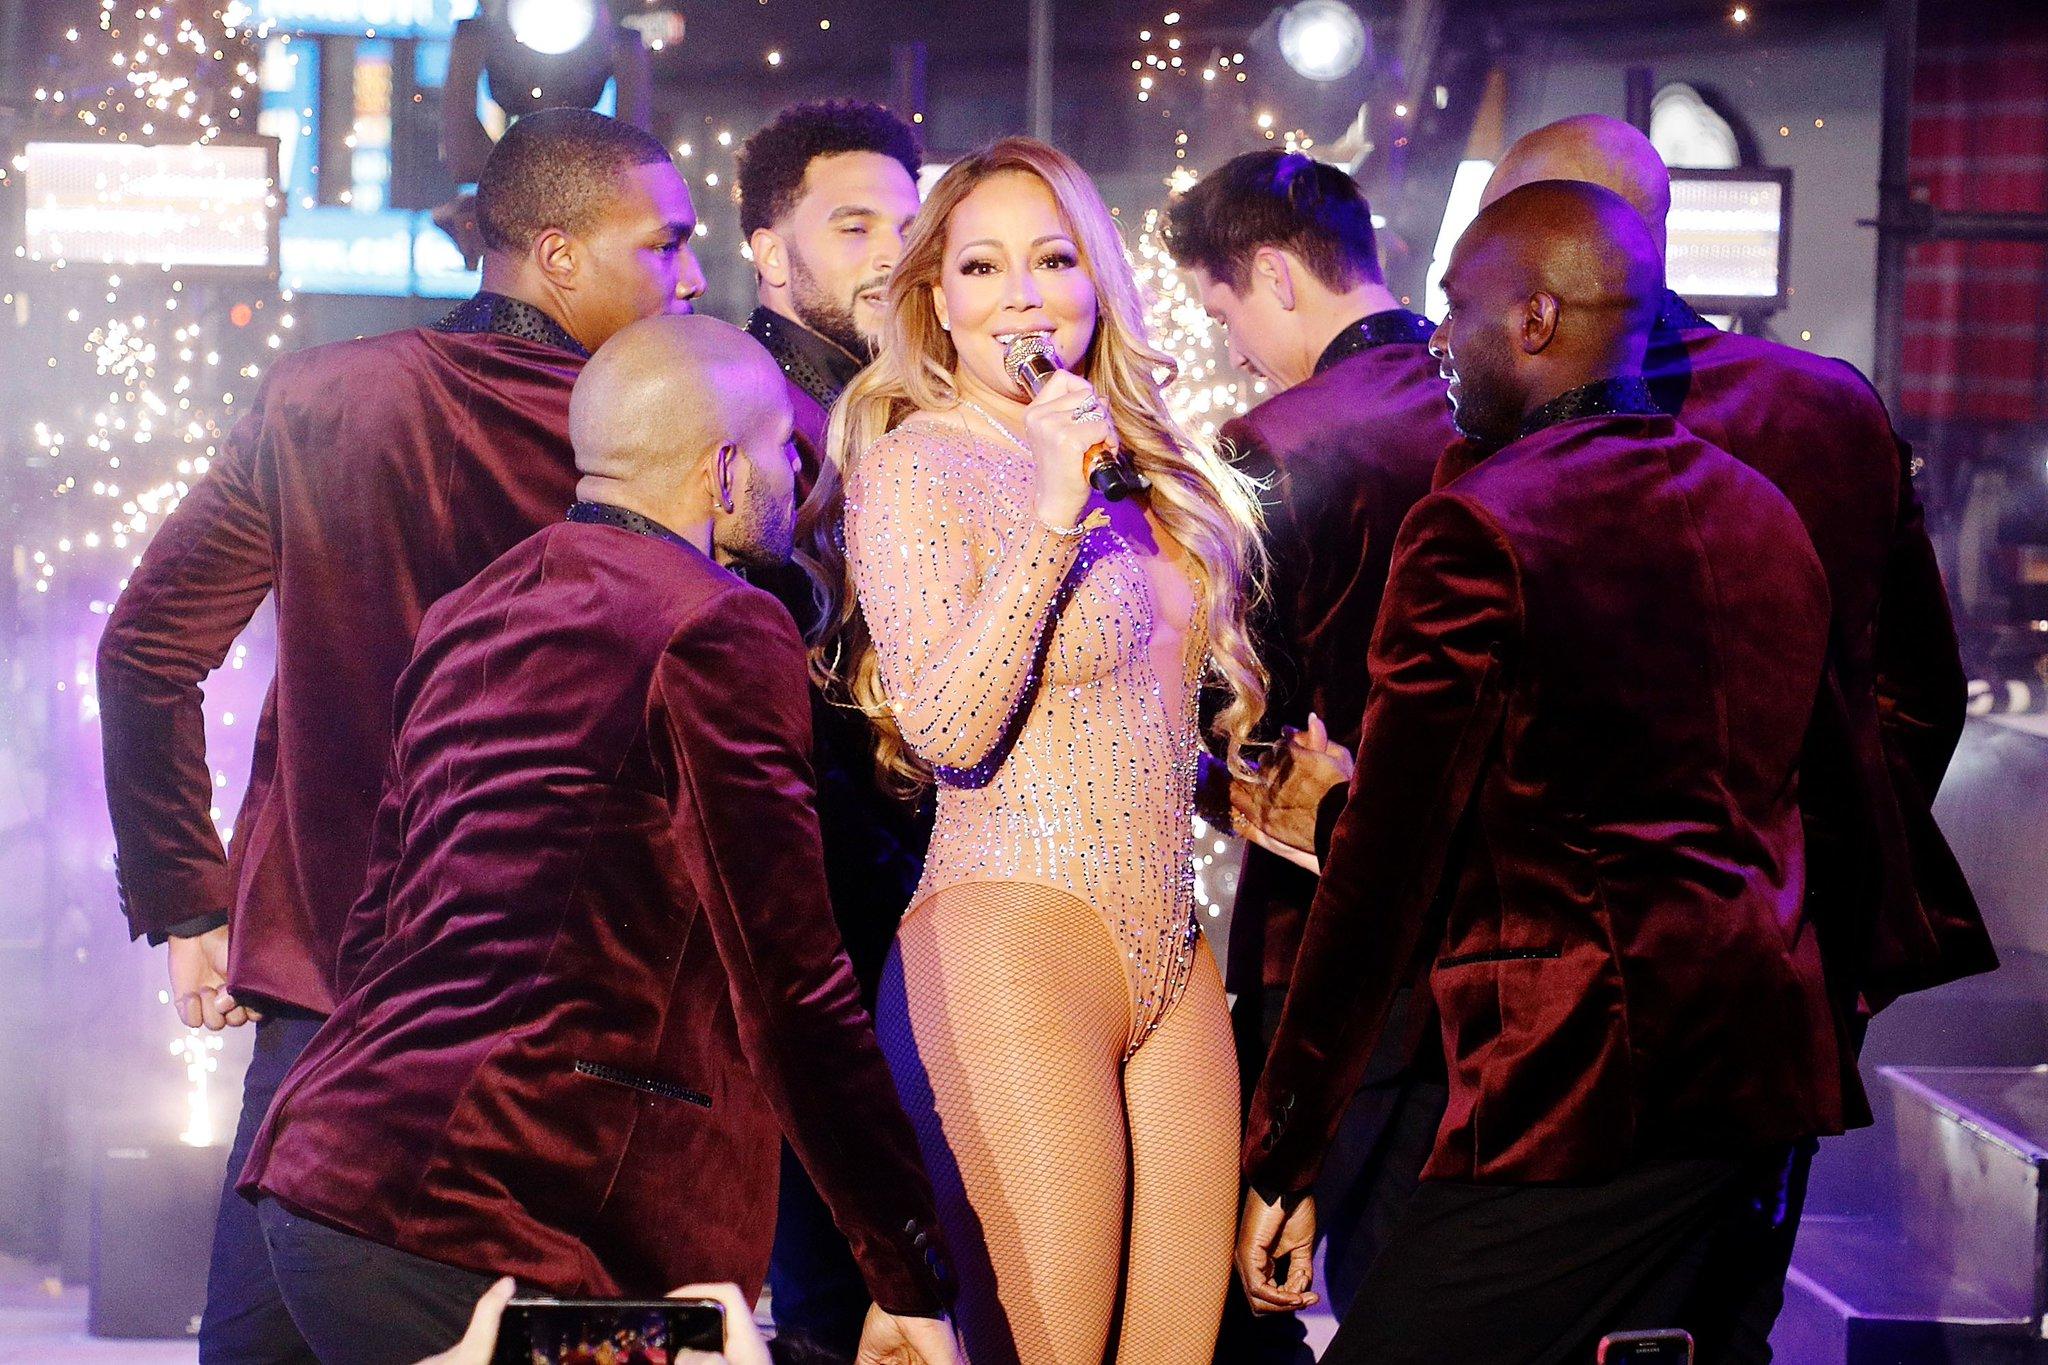 Happy Birthday to Mariah Carey, who turns 47 today!